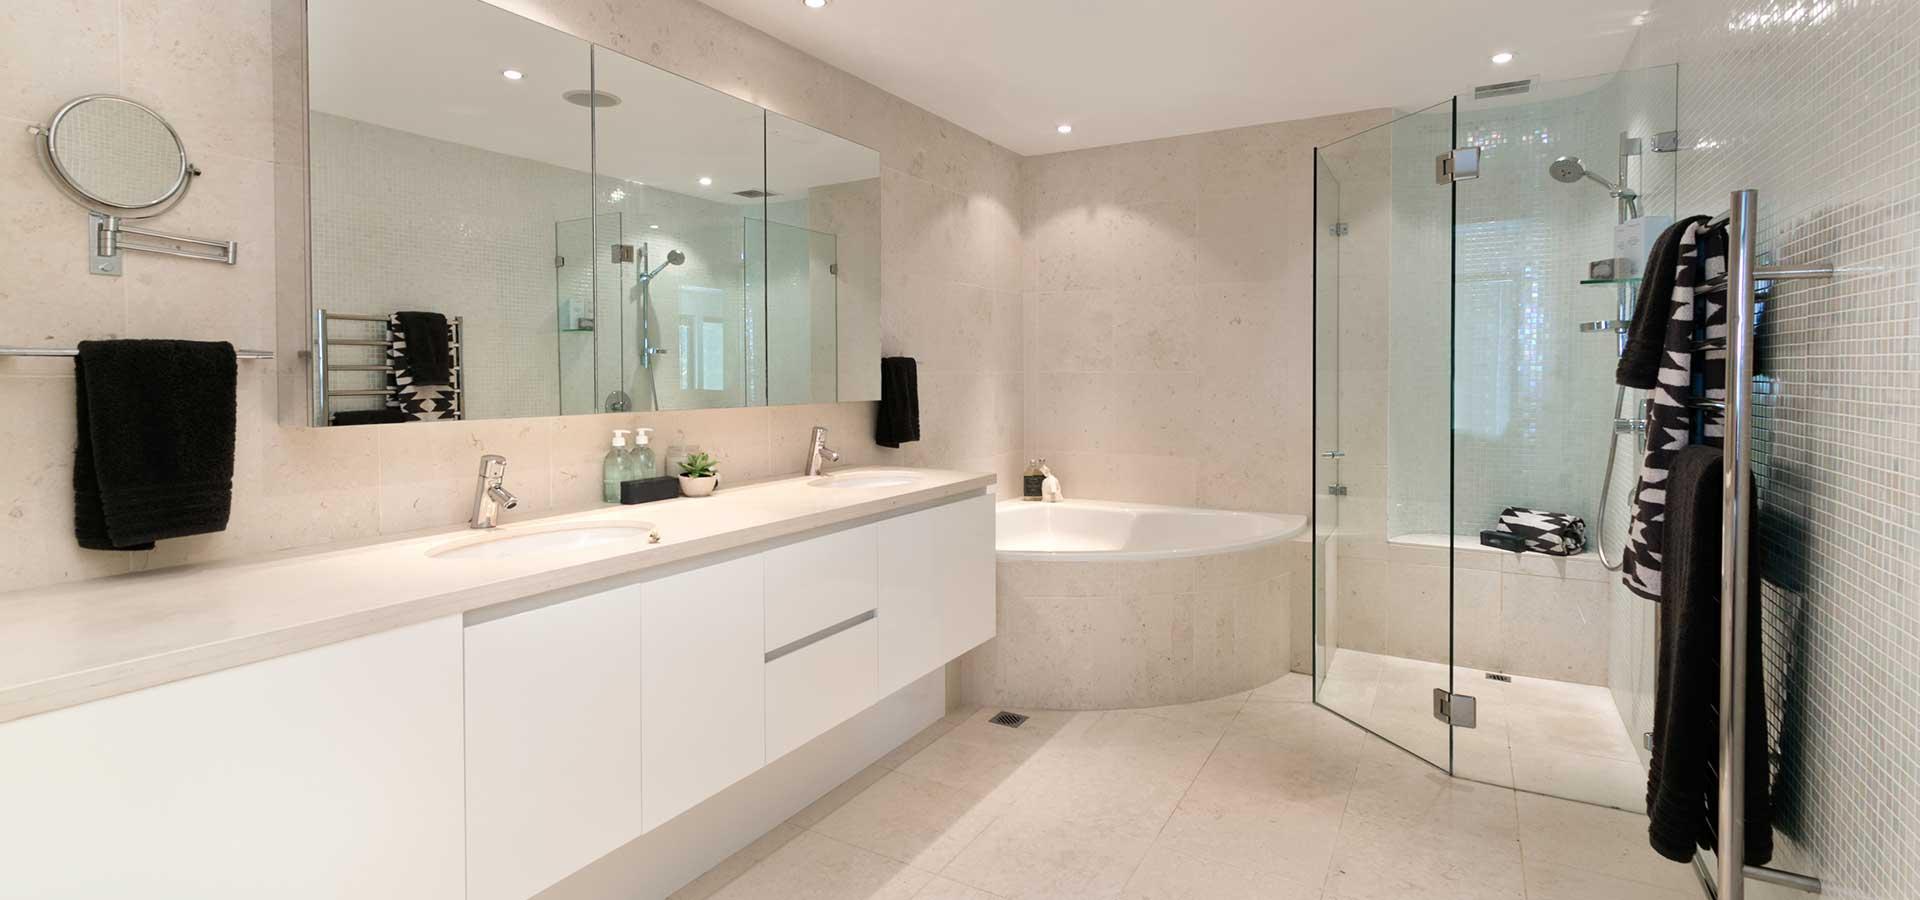 Accessoire Salle De Bain Sherbrooke ~ salle de bain design magog sherbrooke bromont granby